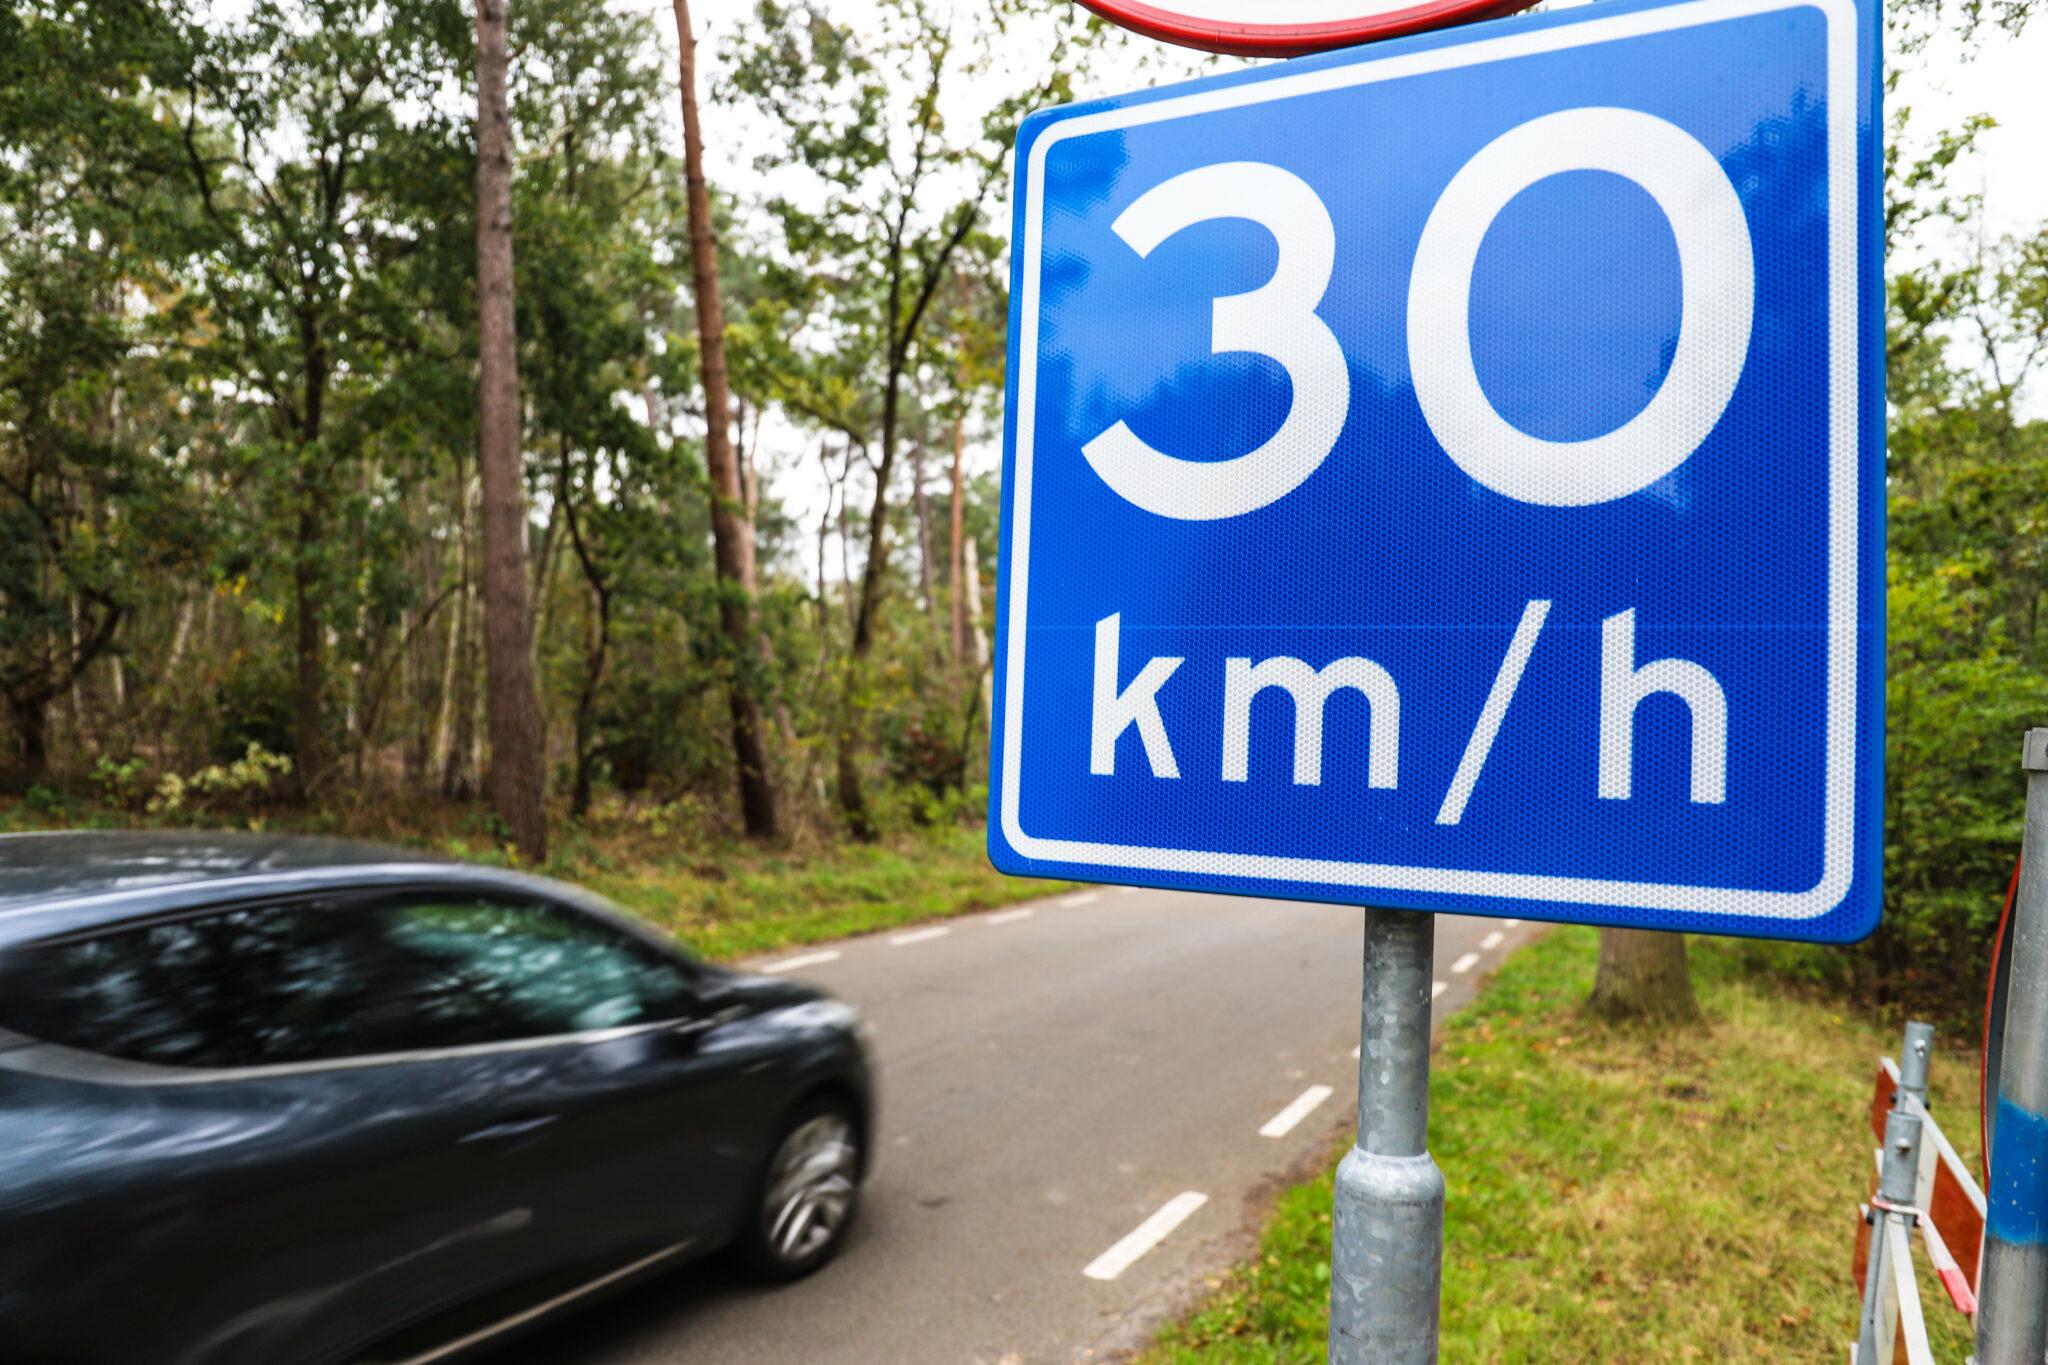 30 km verkeersbord blauw bord auto